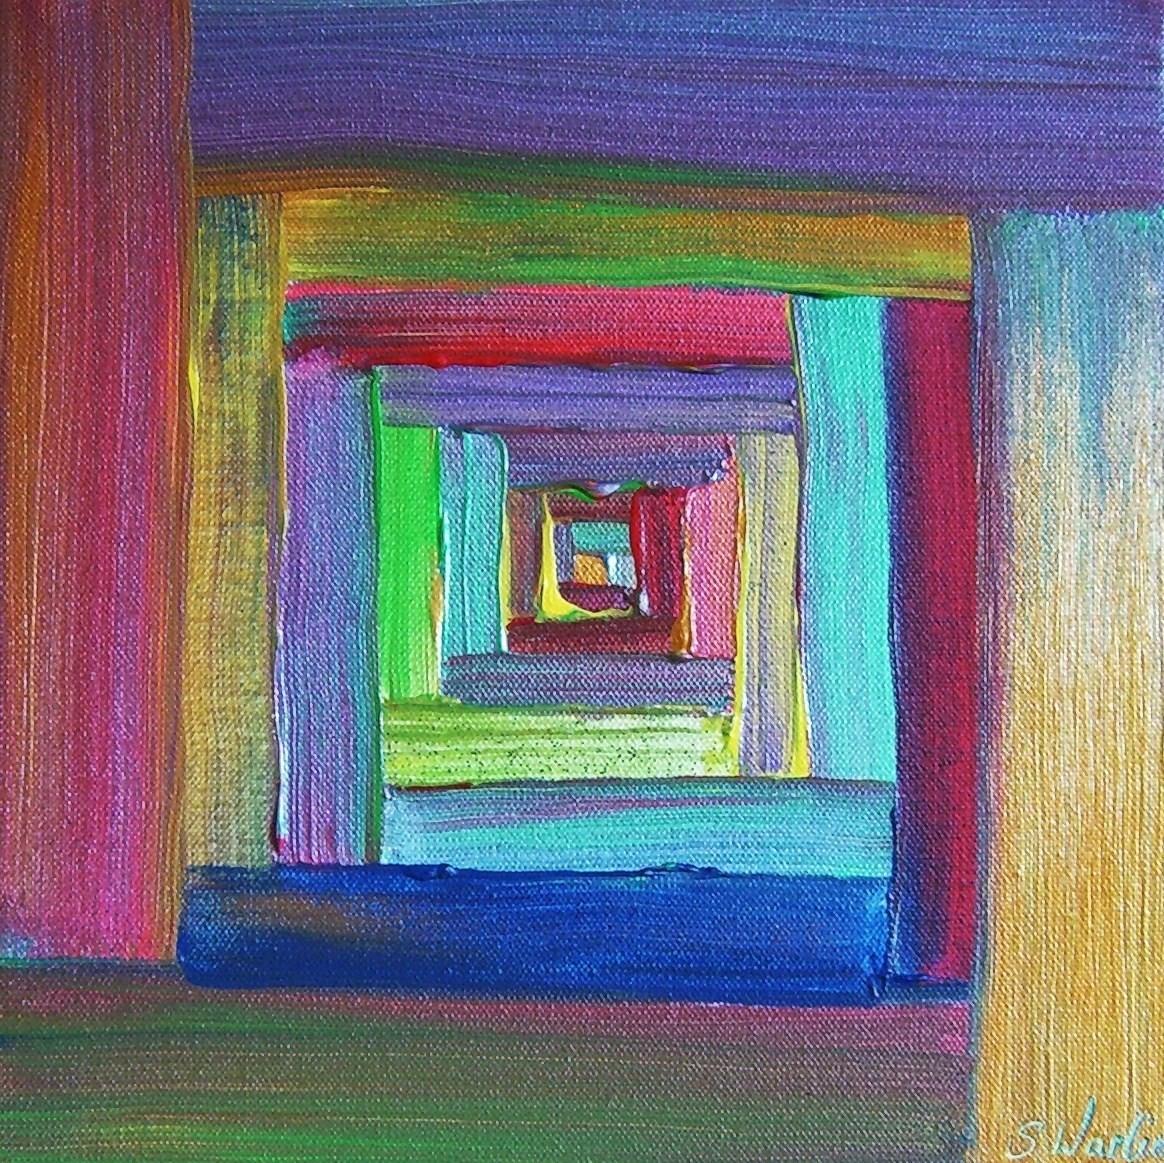 Acryl auf Leinwand - 40x40